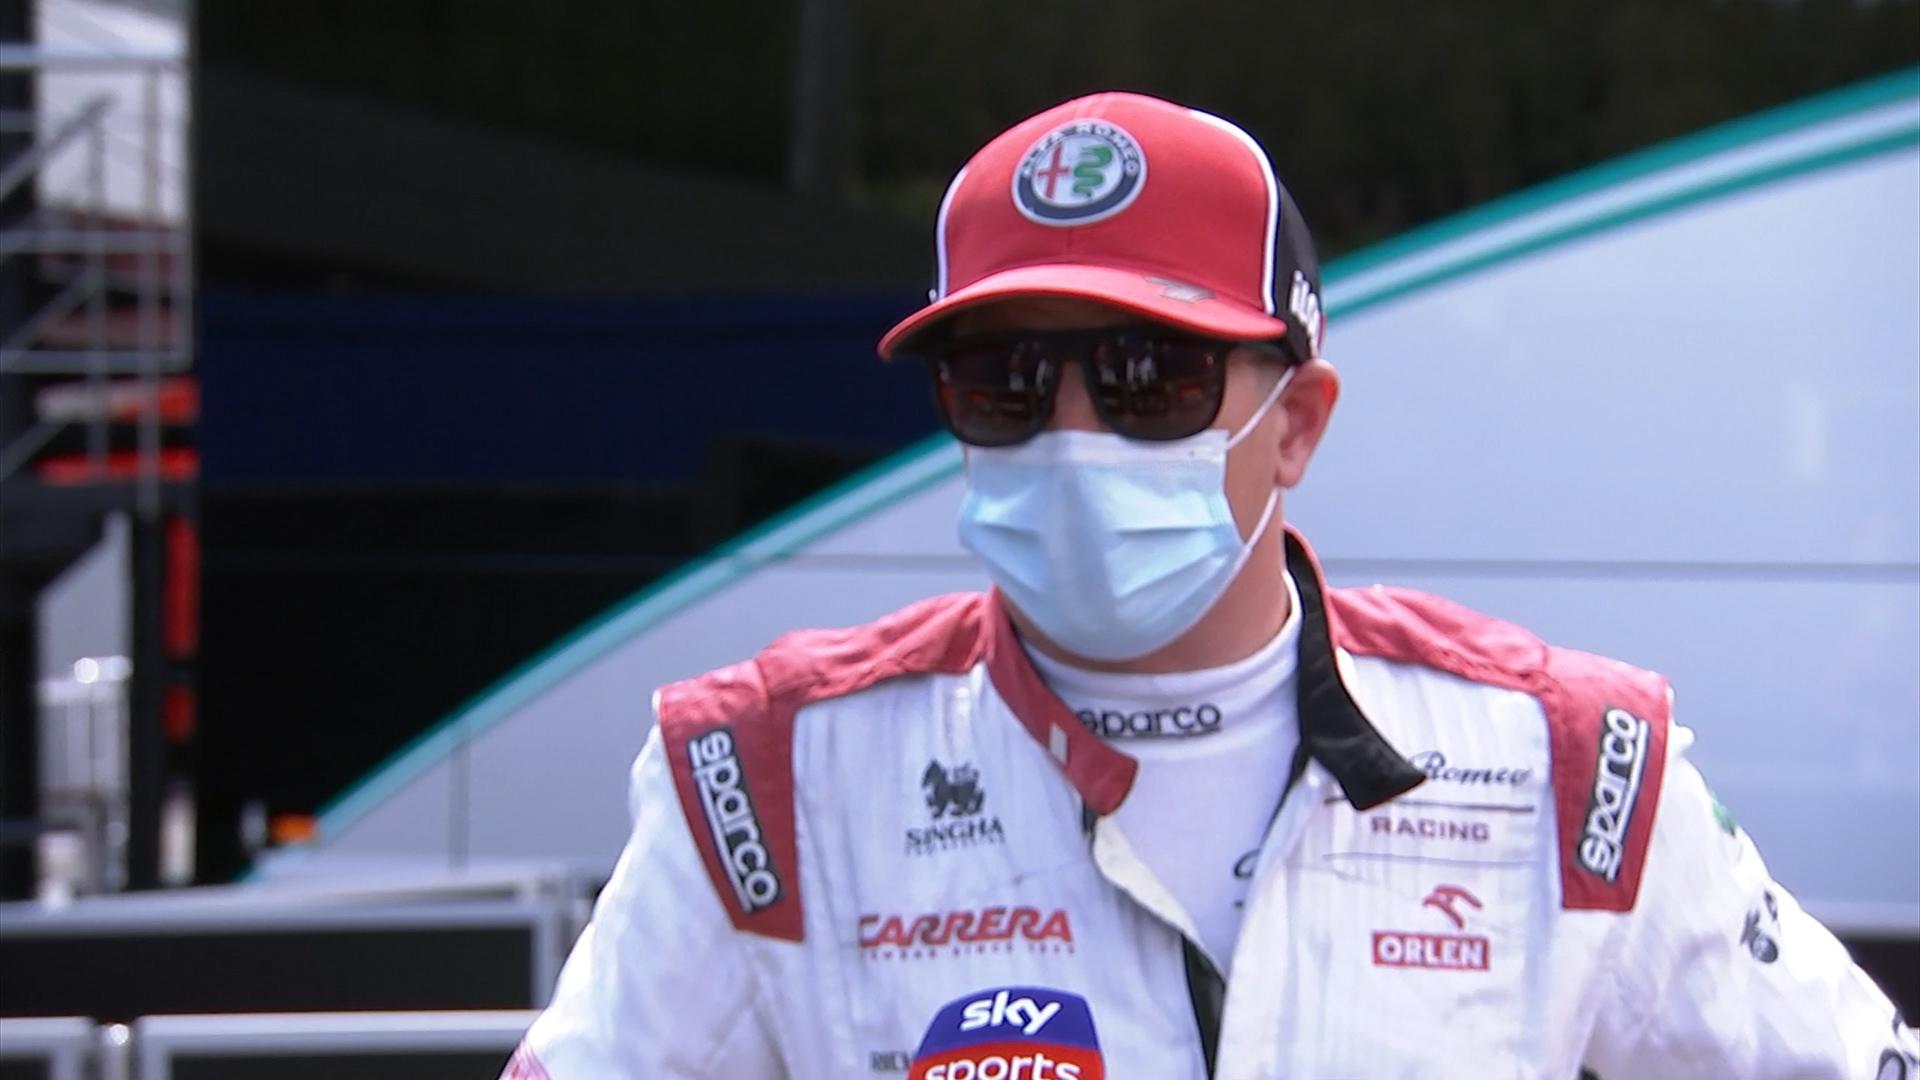 Kimi Raikkonen: 'It's where we are right now'